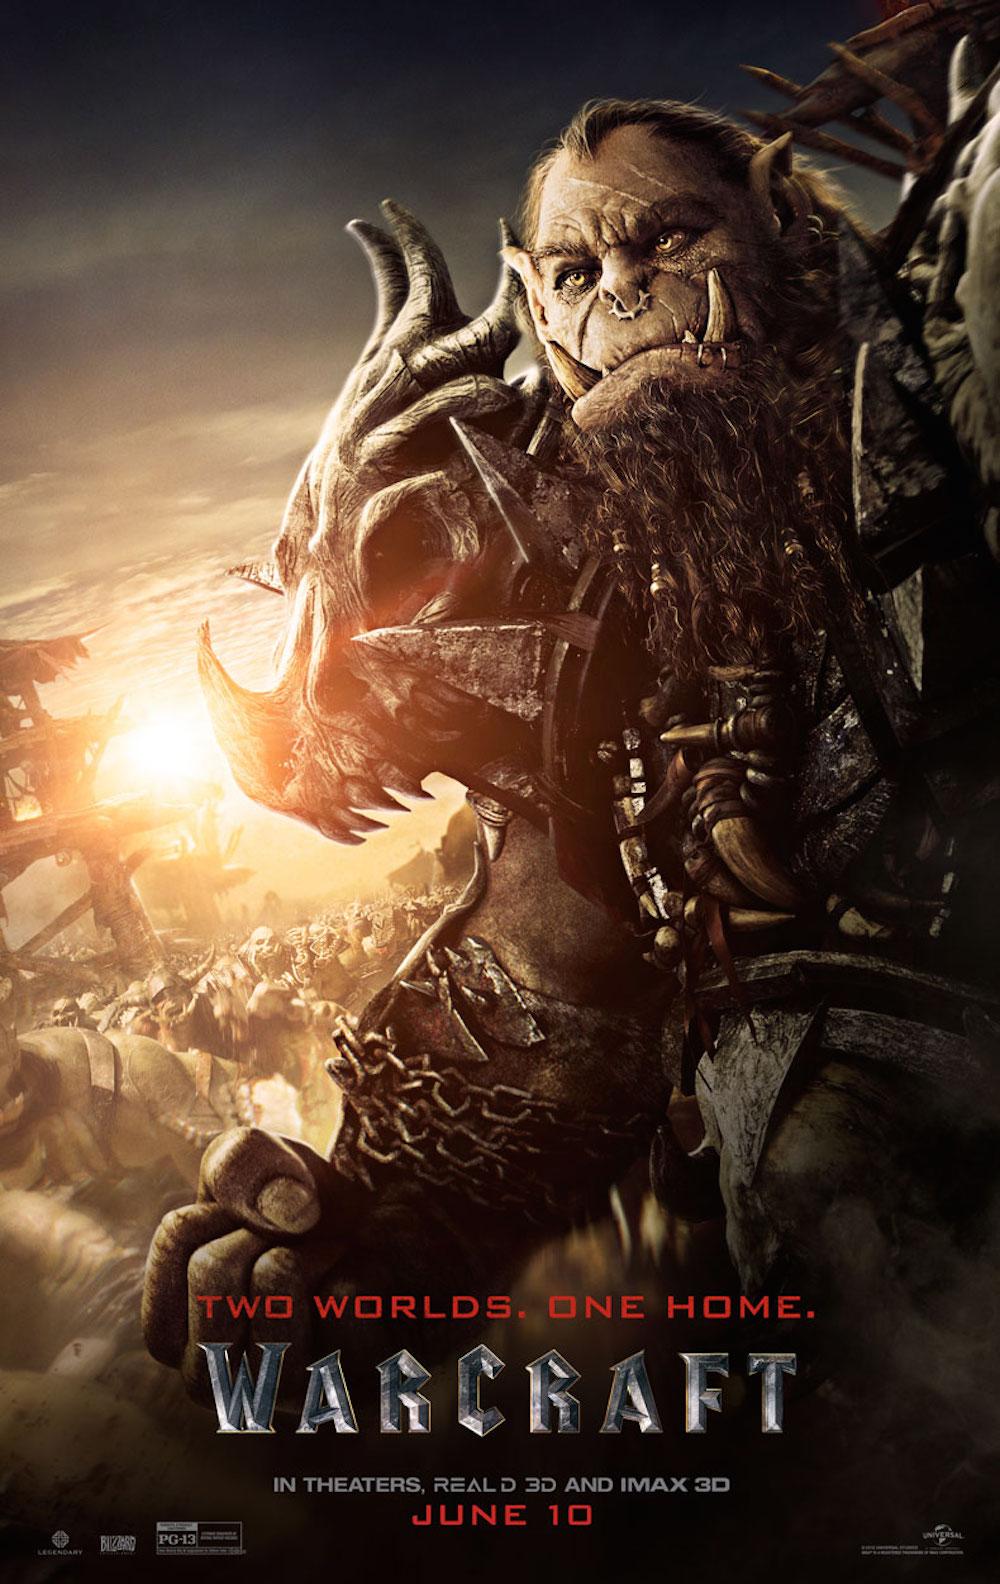 Warcraft poster blackhand the destroyer